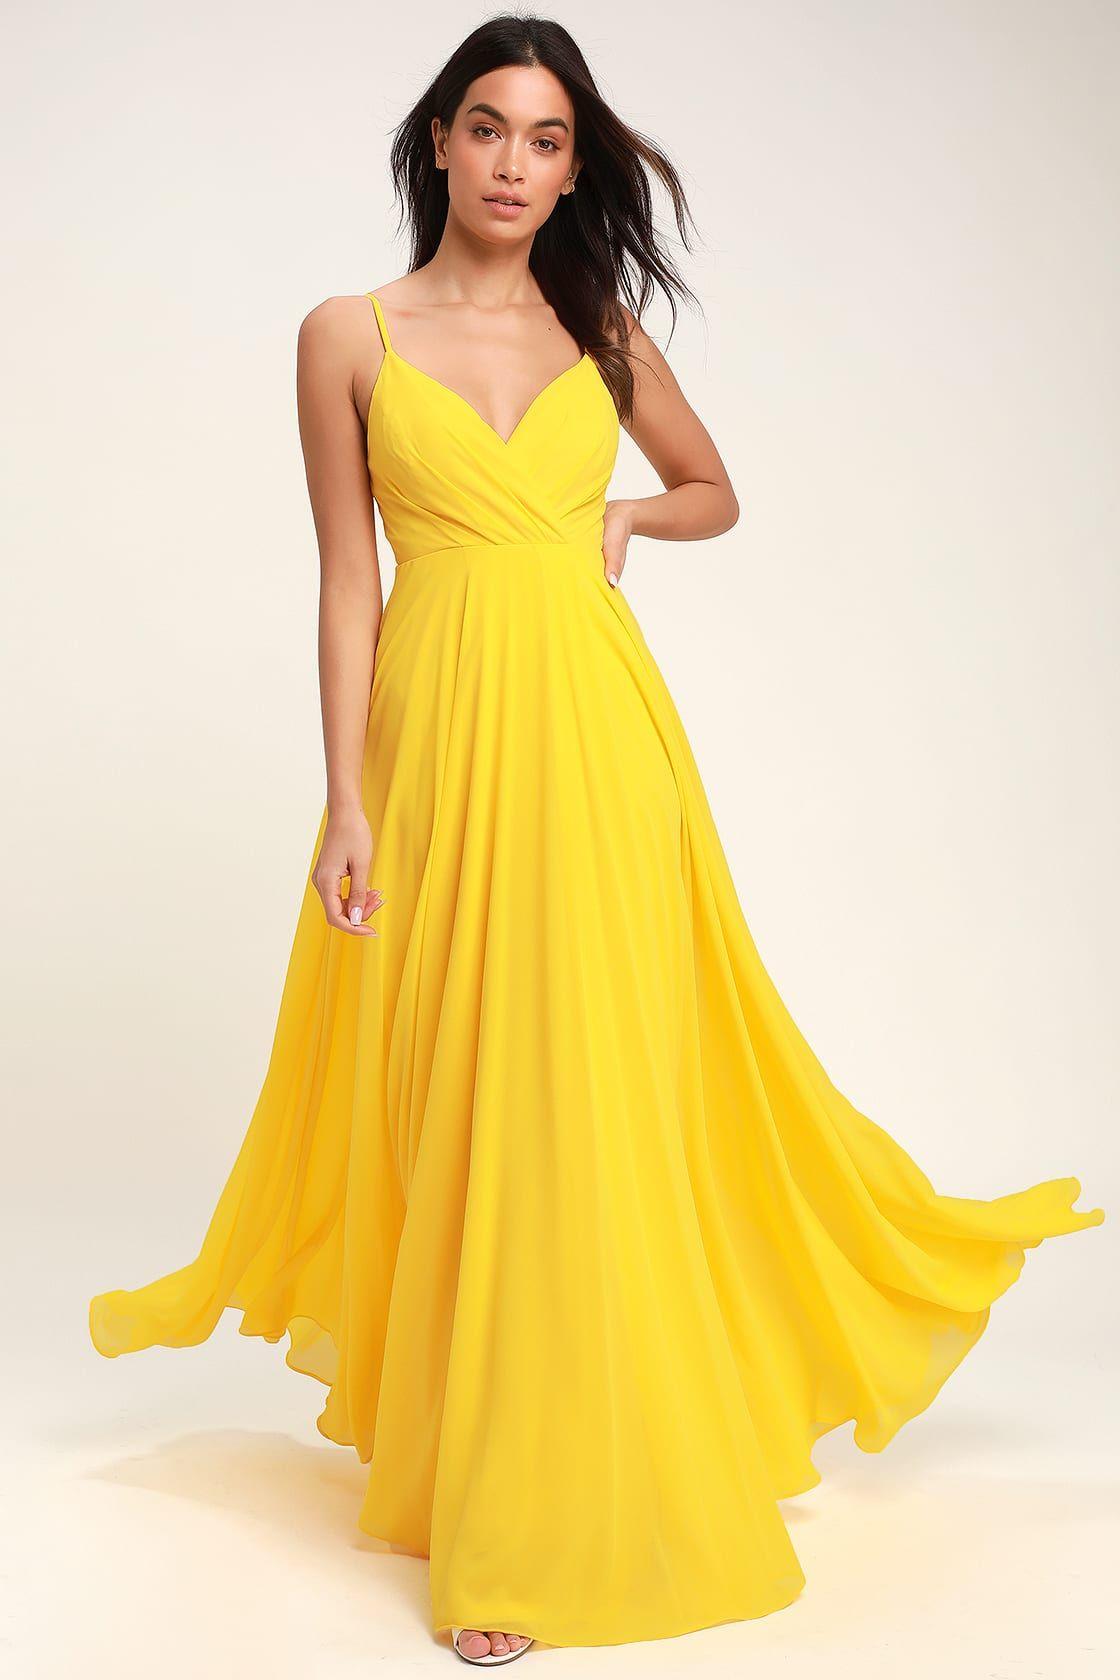 43++ Pastel yellow wedding guest dress information